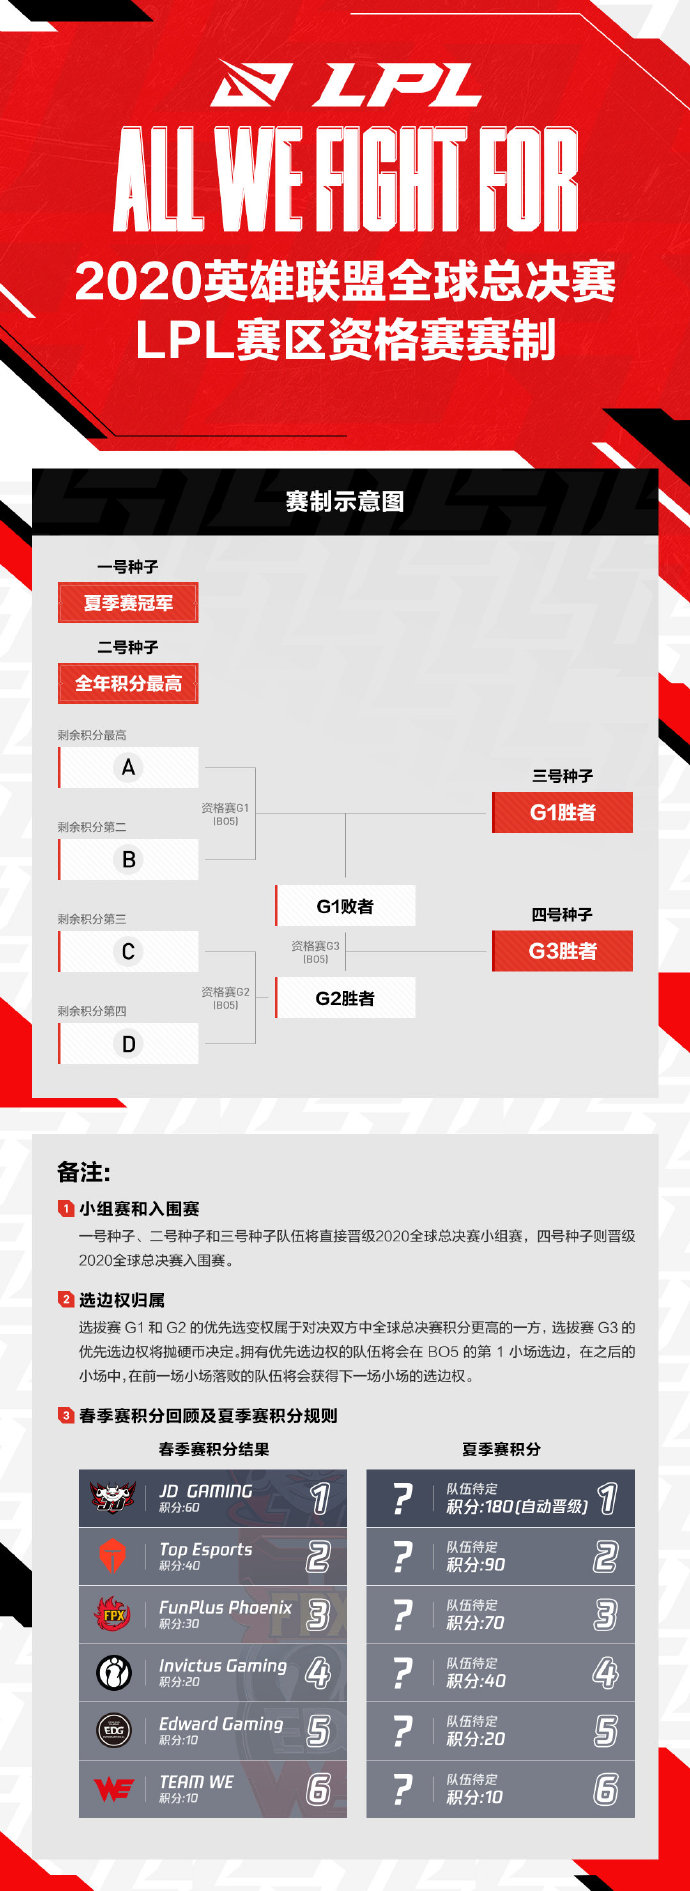 S10资格赛赛制公布:四支战队决出两个种子名额